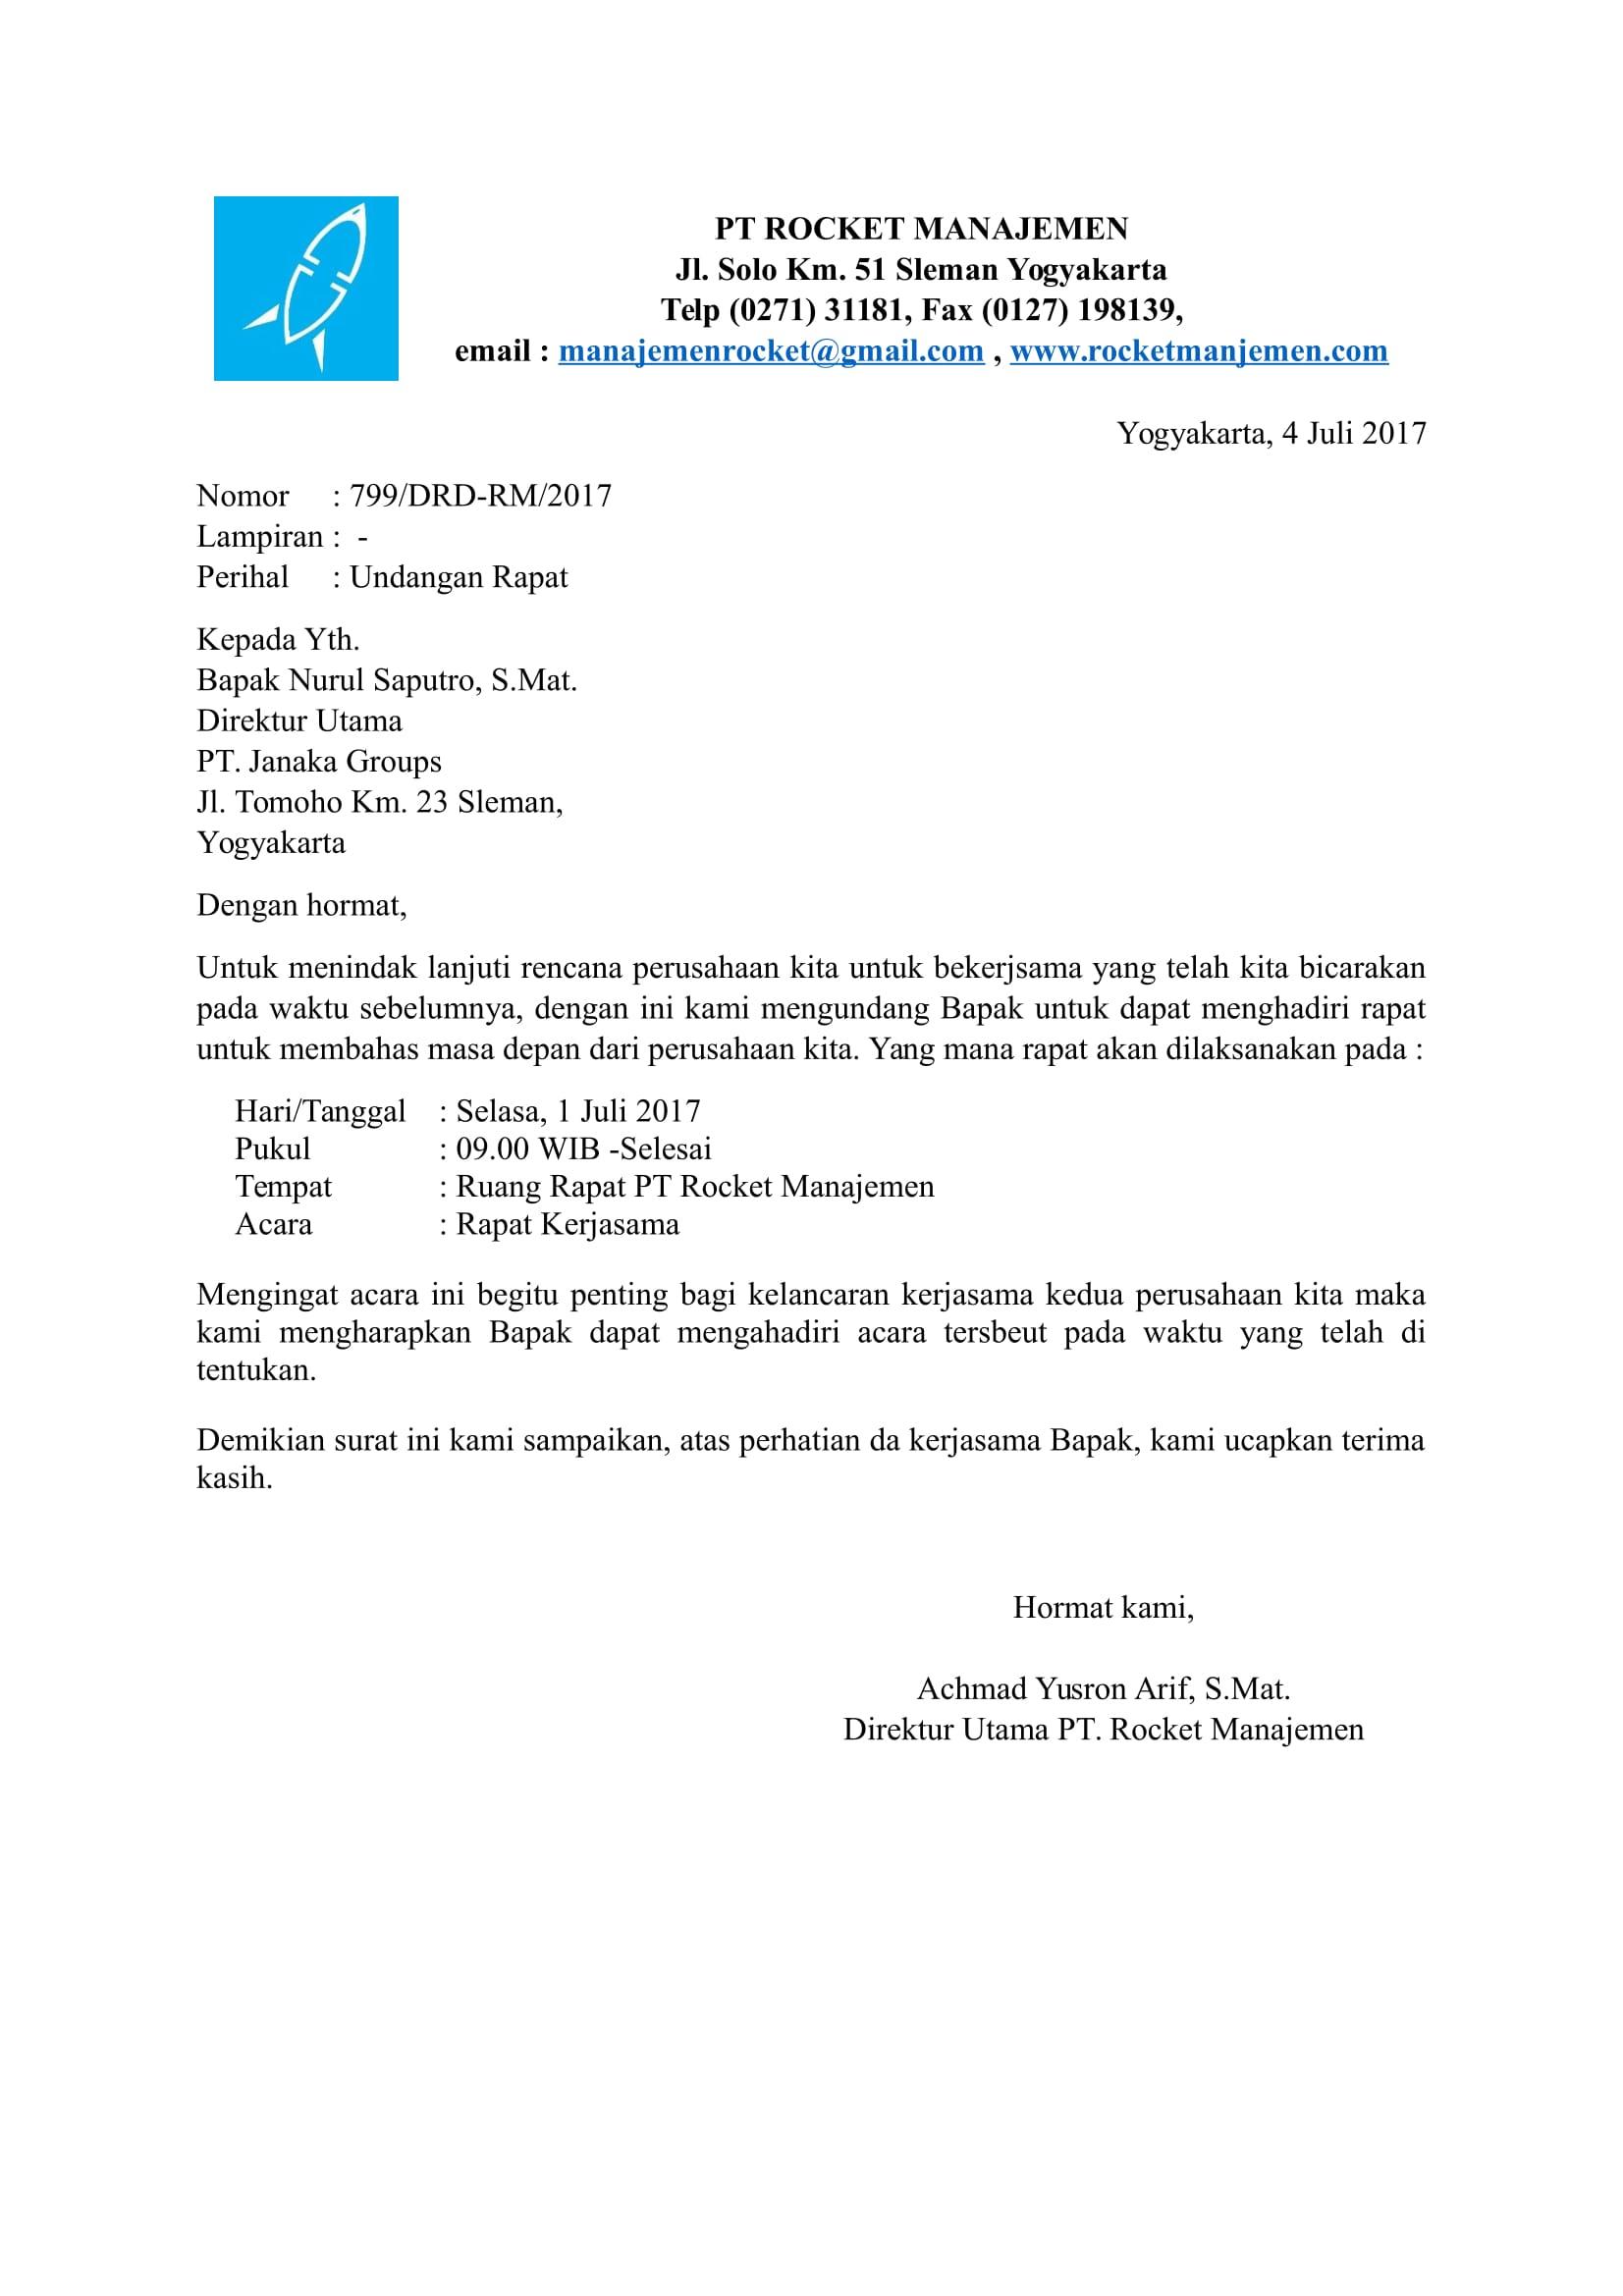 Contoh Email Formal : contoh, email, formal, Contoh, Surat, Resmi, Perusahaan, Dancehotline